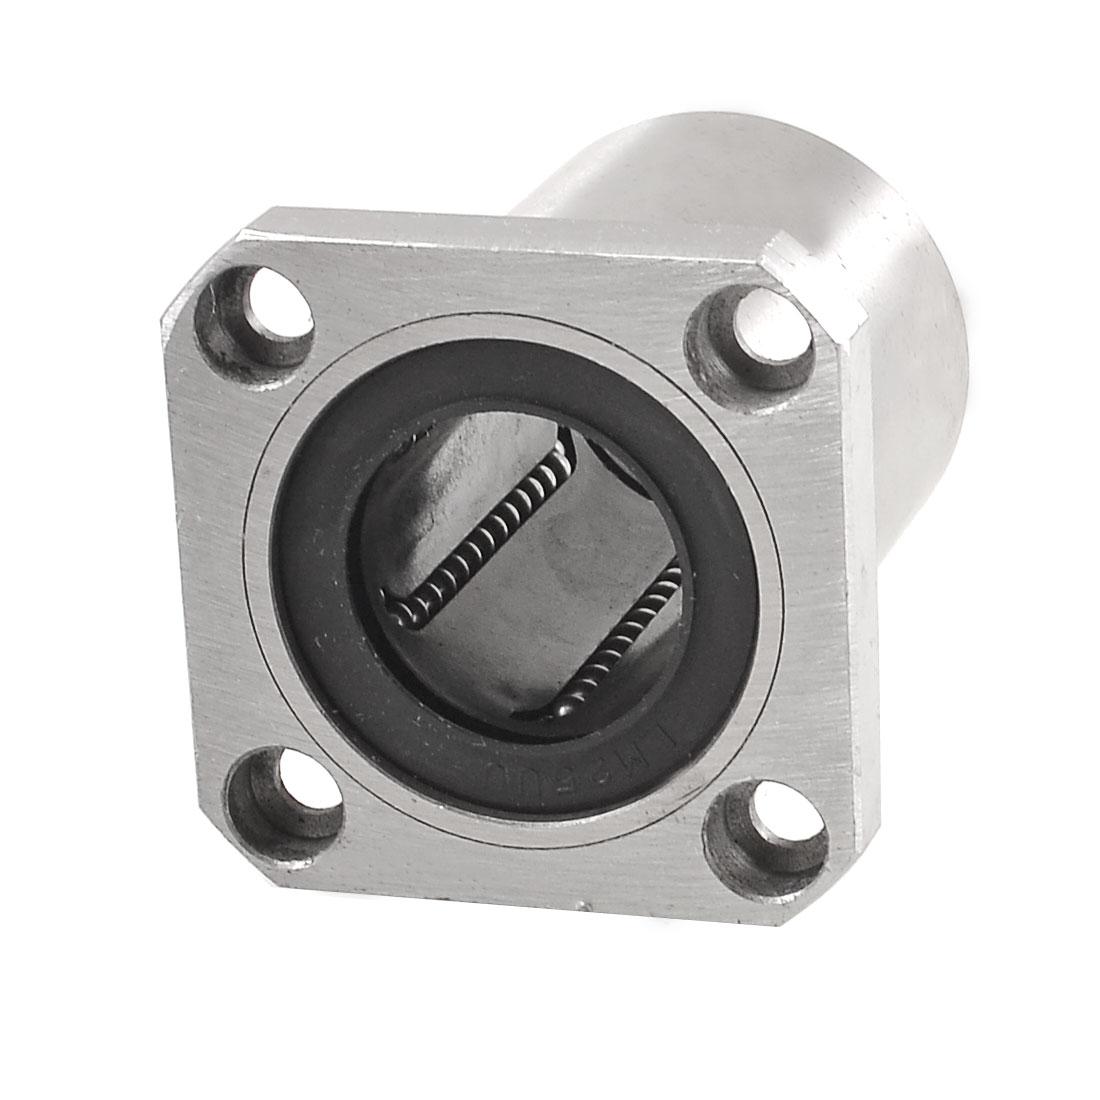 25mm Inner Diameter Square Flange Linear Motion Bushing Ball Bearing LMK25UU